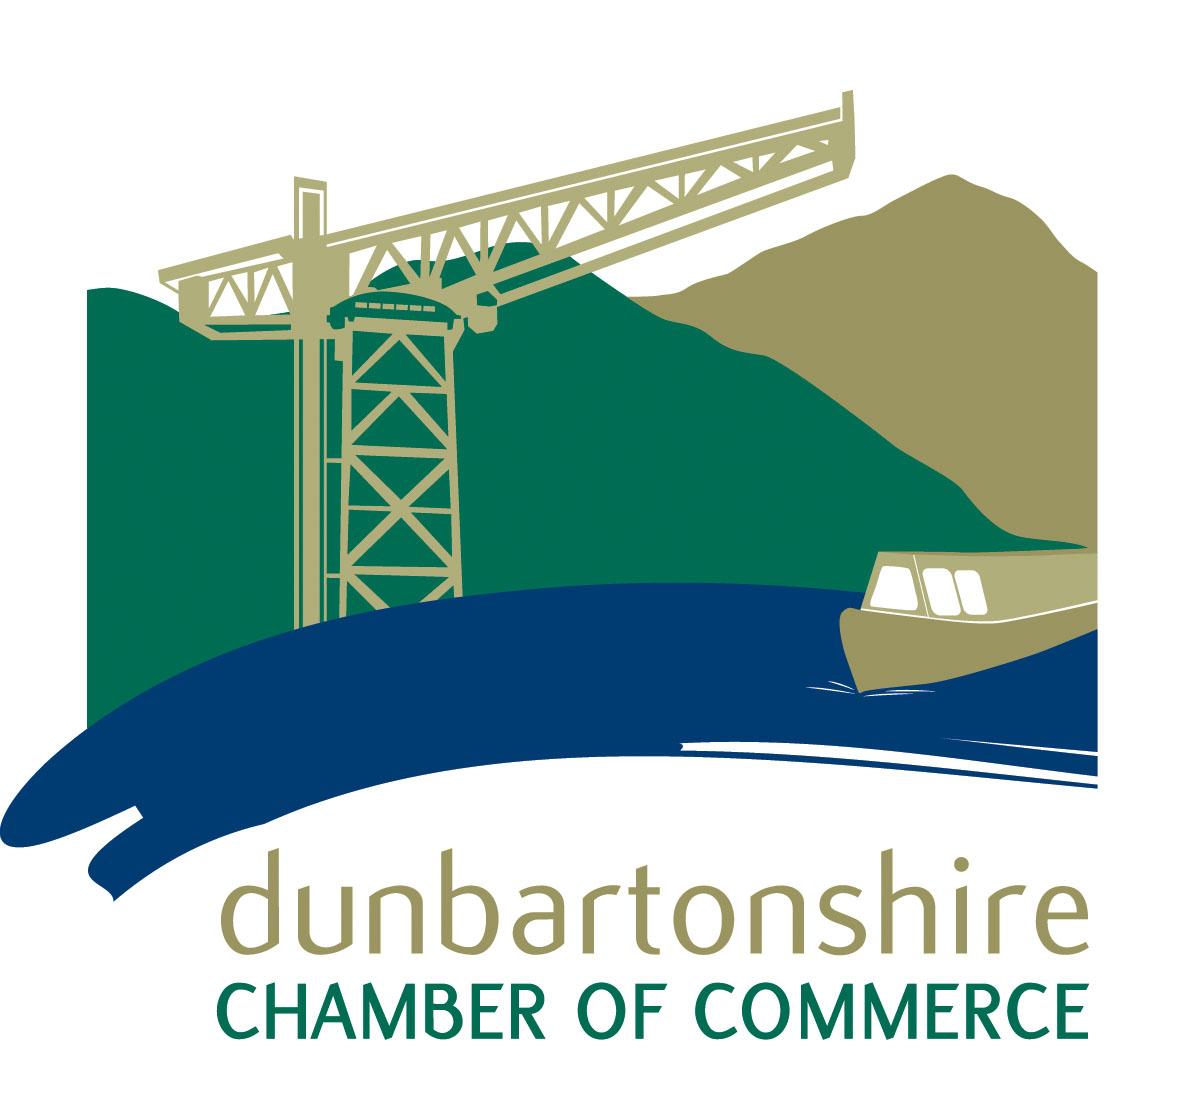 Dunbartonshire Chamber of Commerce